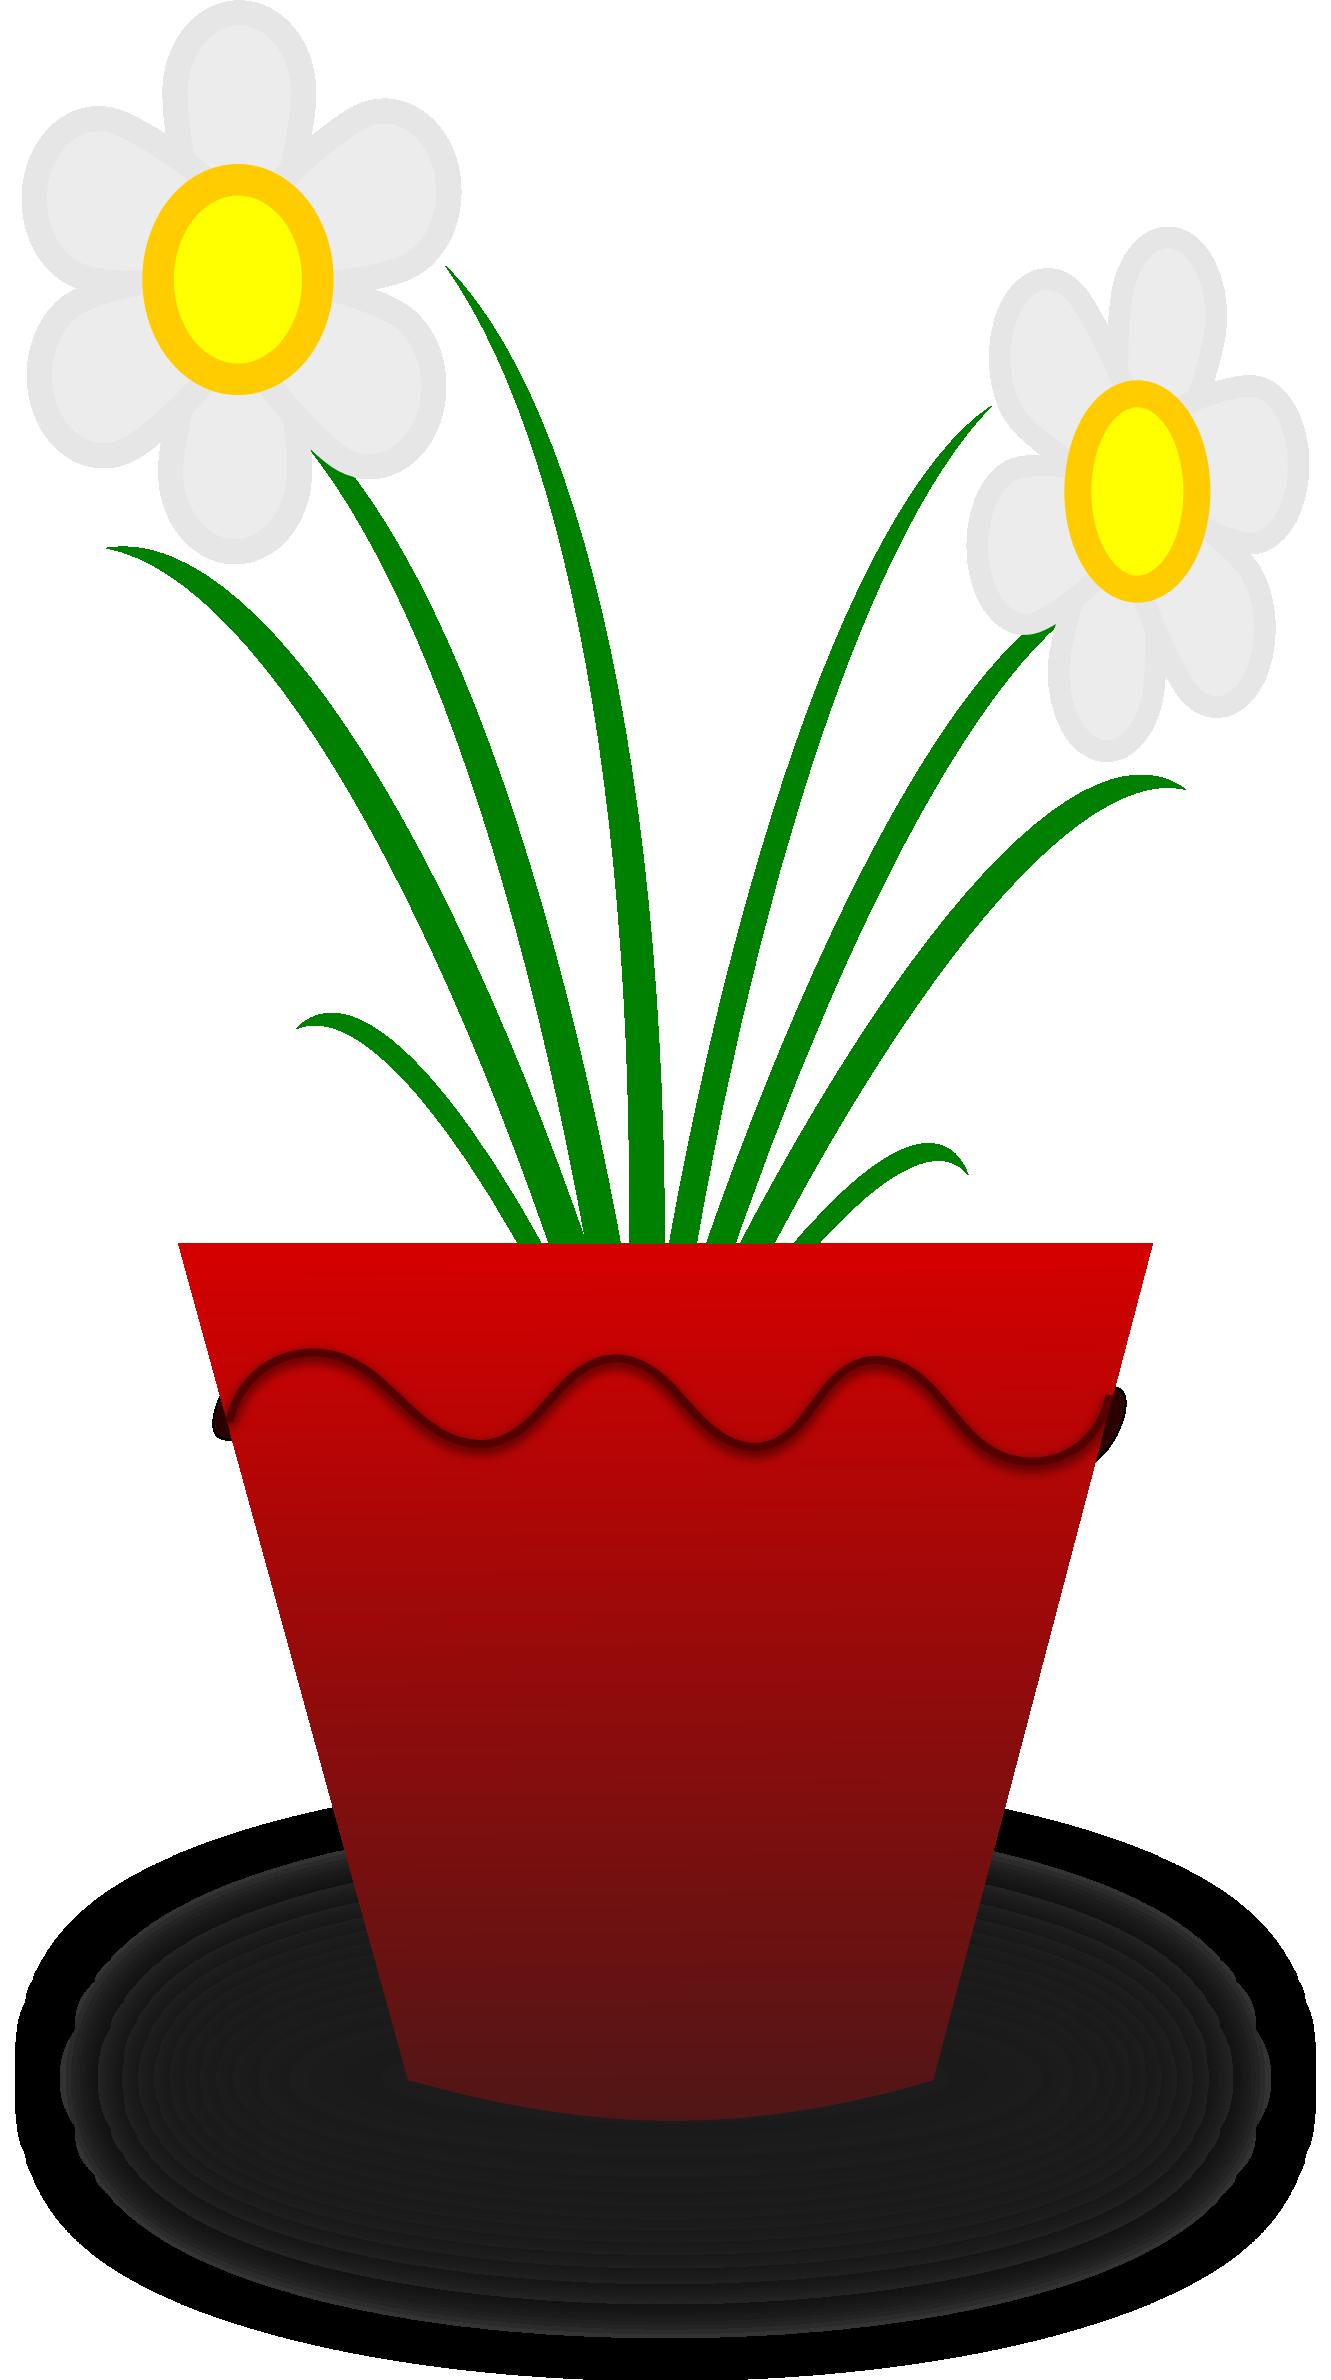 Pics Of Flower Pots - Cliparts.co